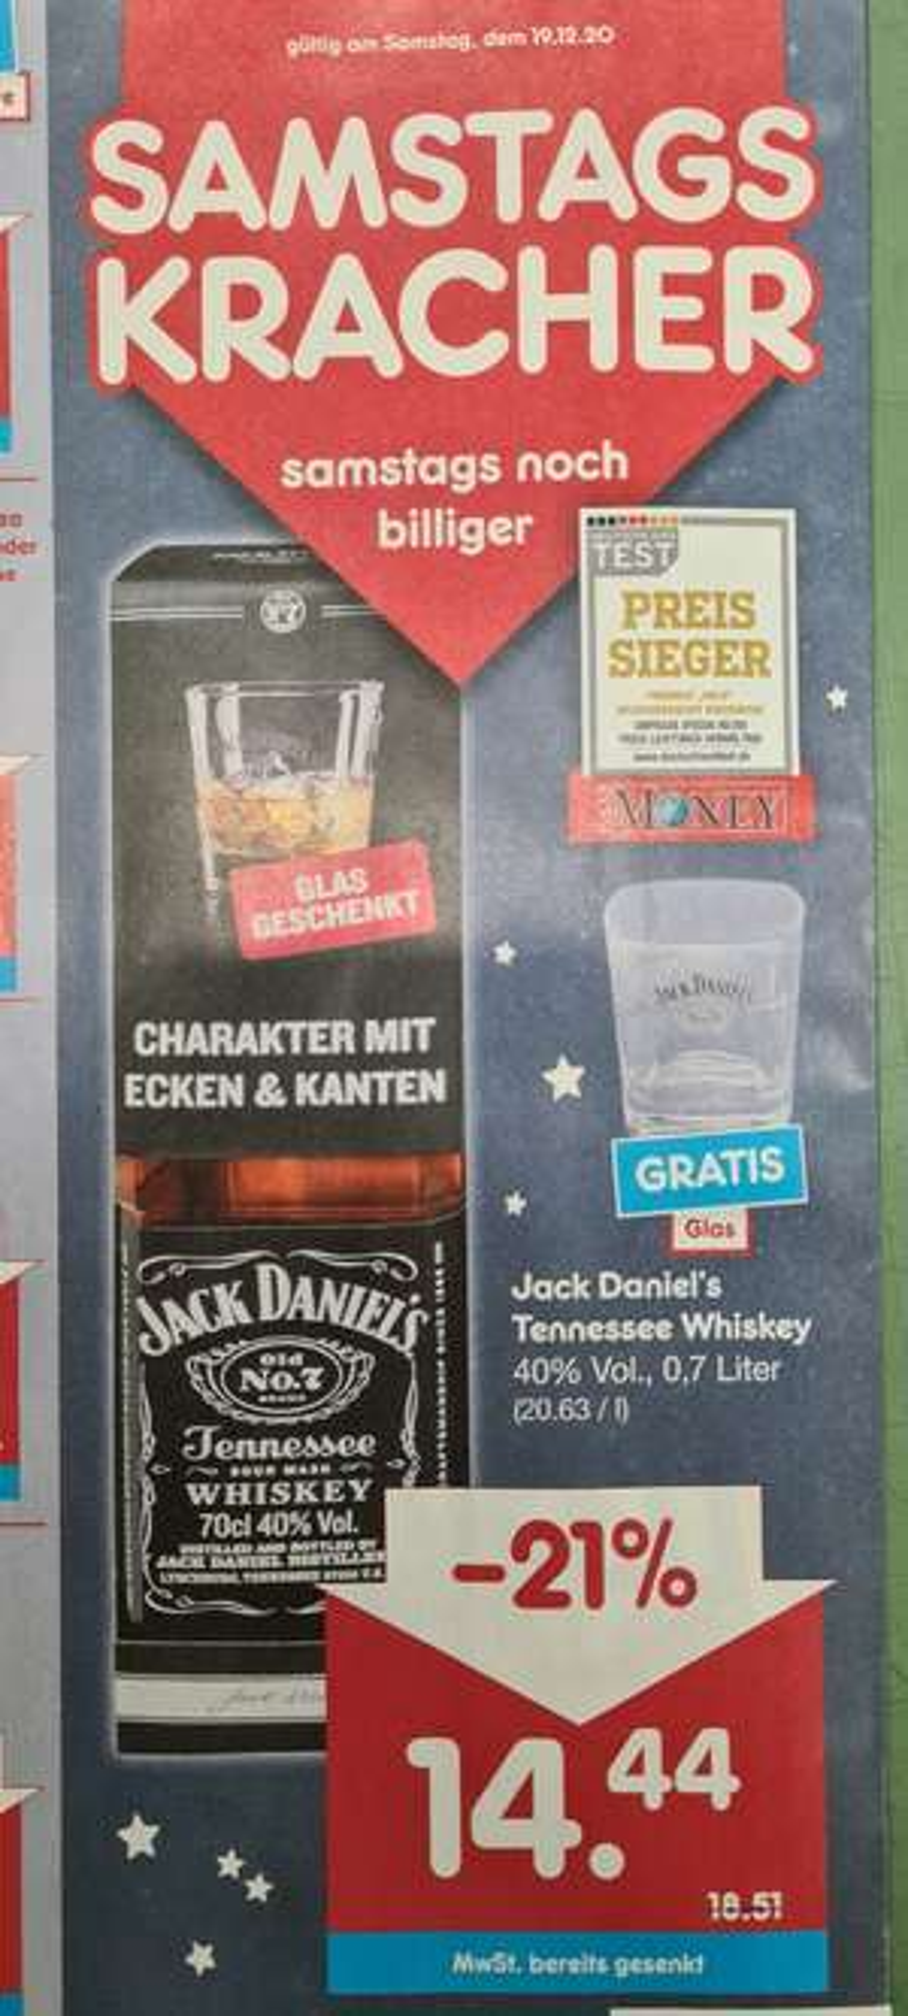 [Netto MD] Samstagskracher am 19.12. - Jack Daniel's Whiskey inkl. Glas